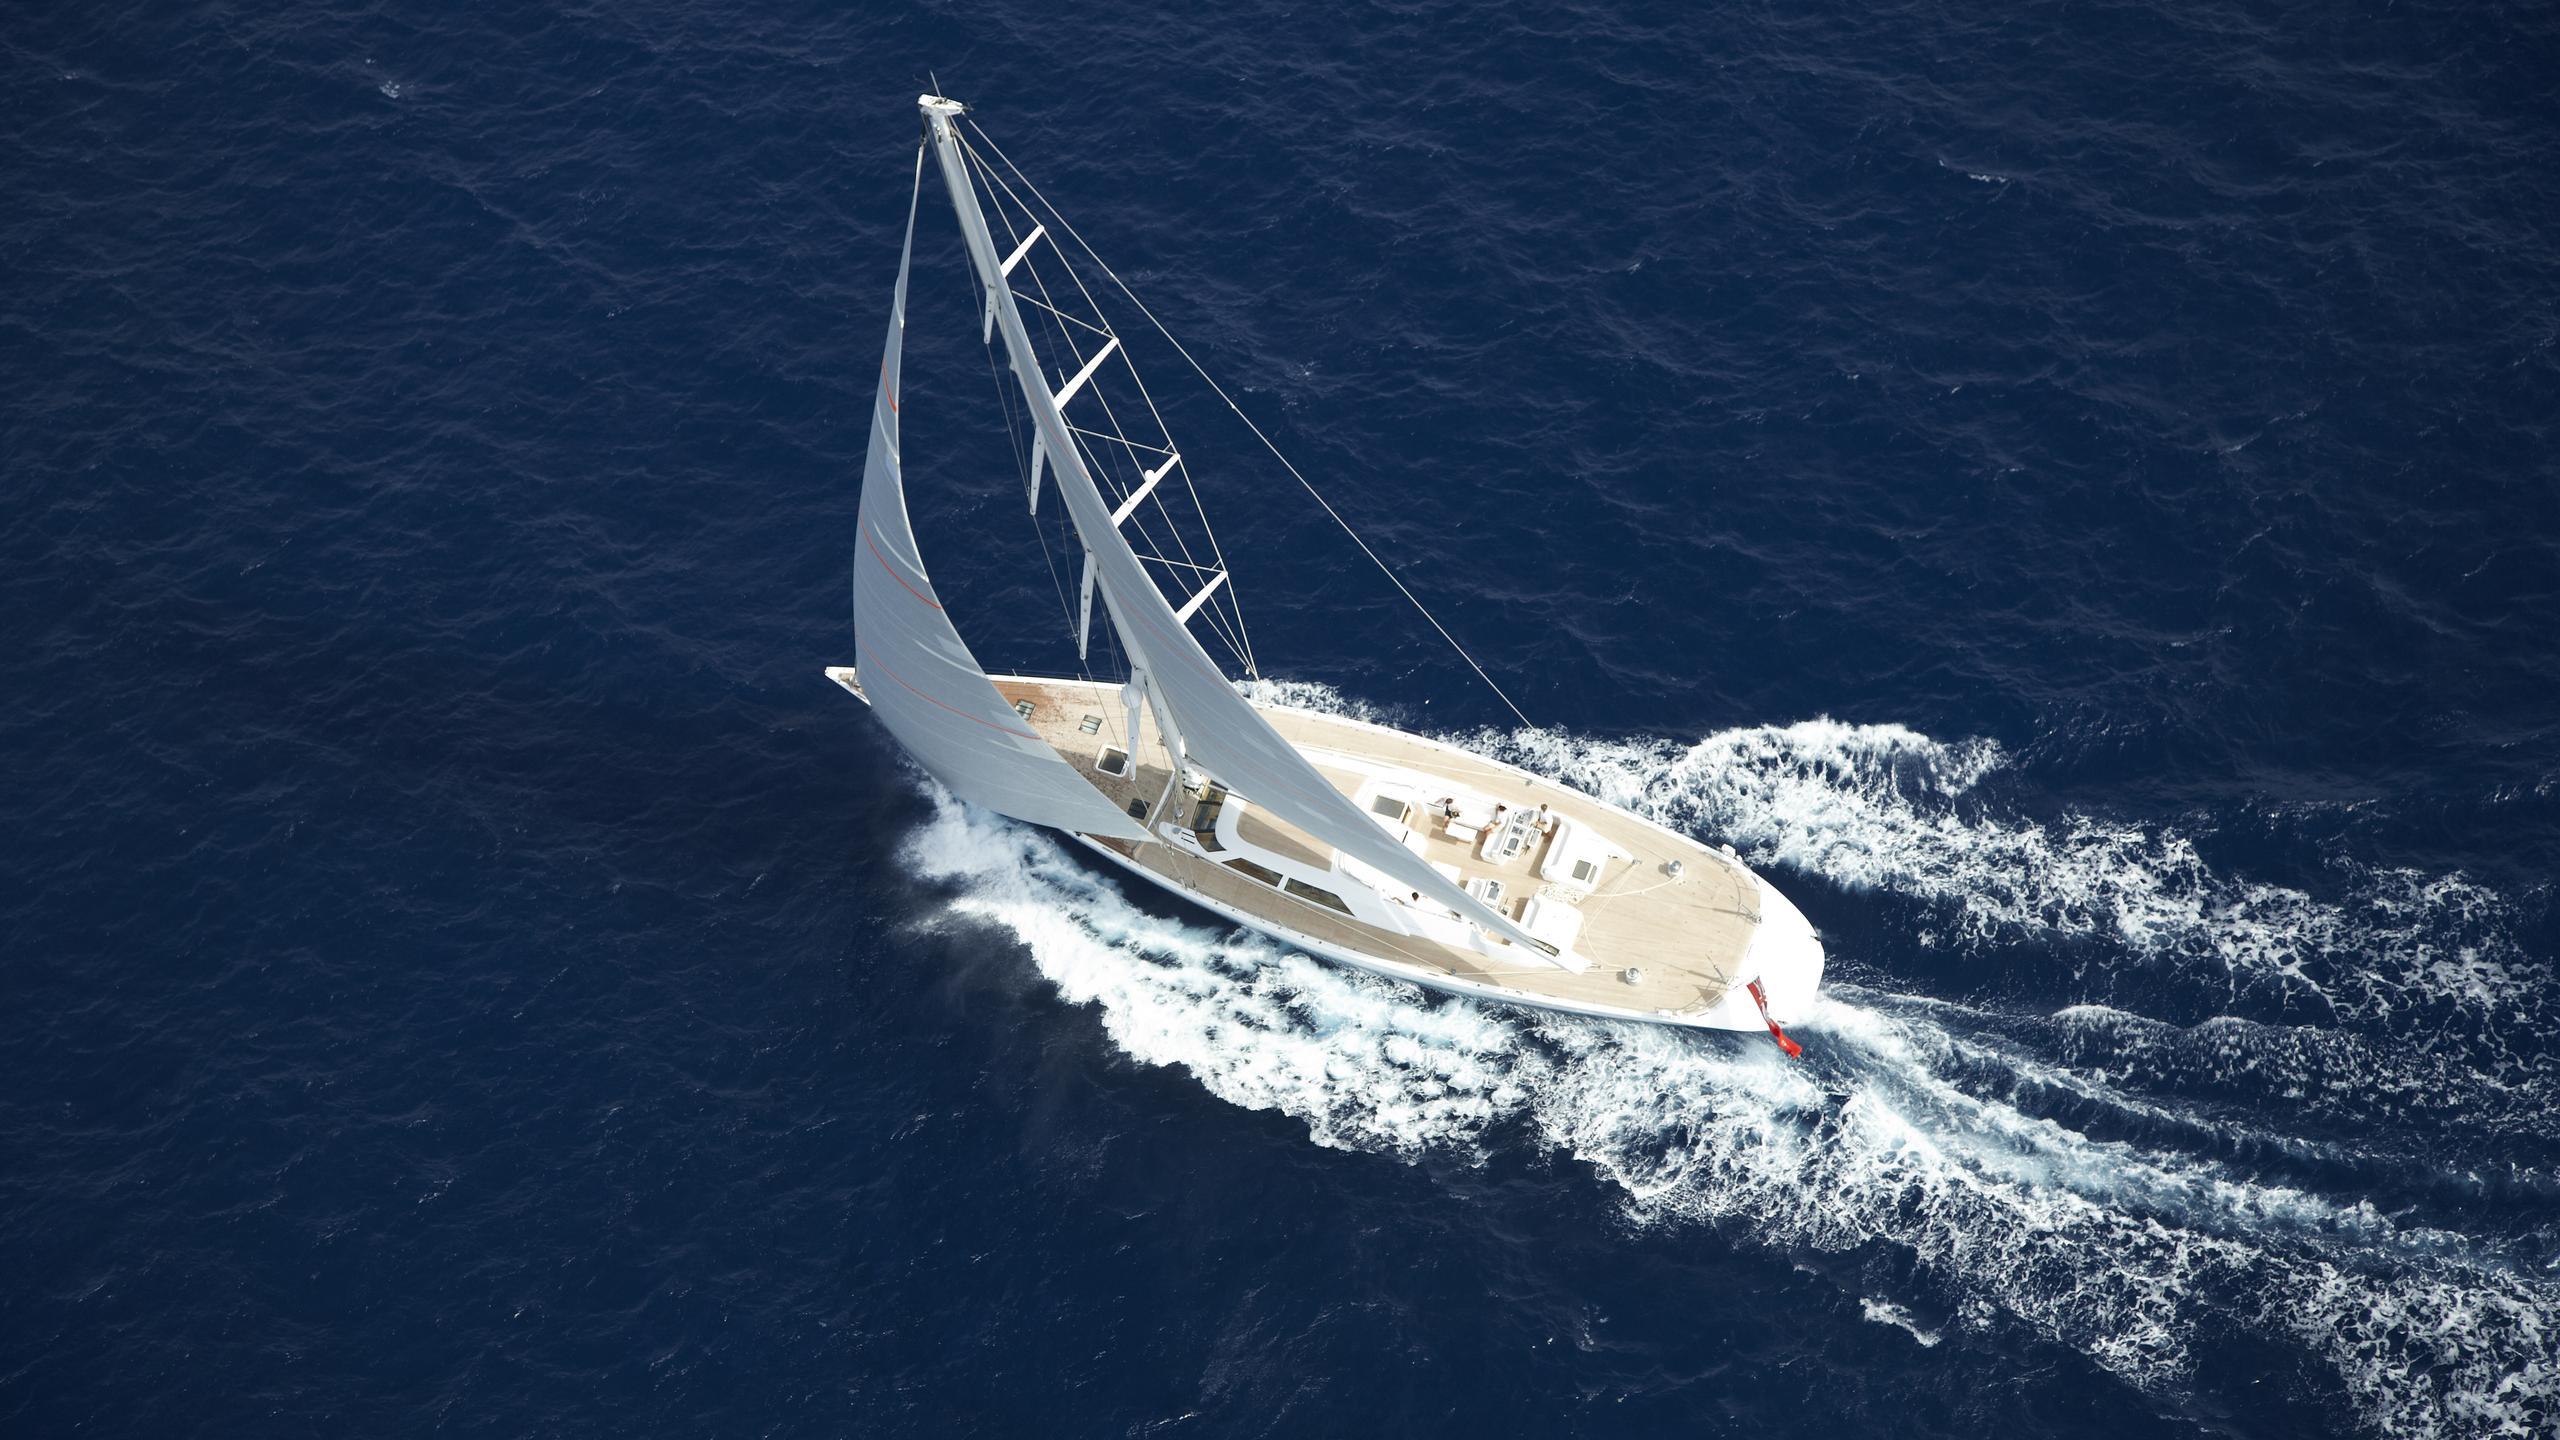 unfurled-yacht-aerial